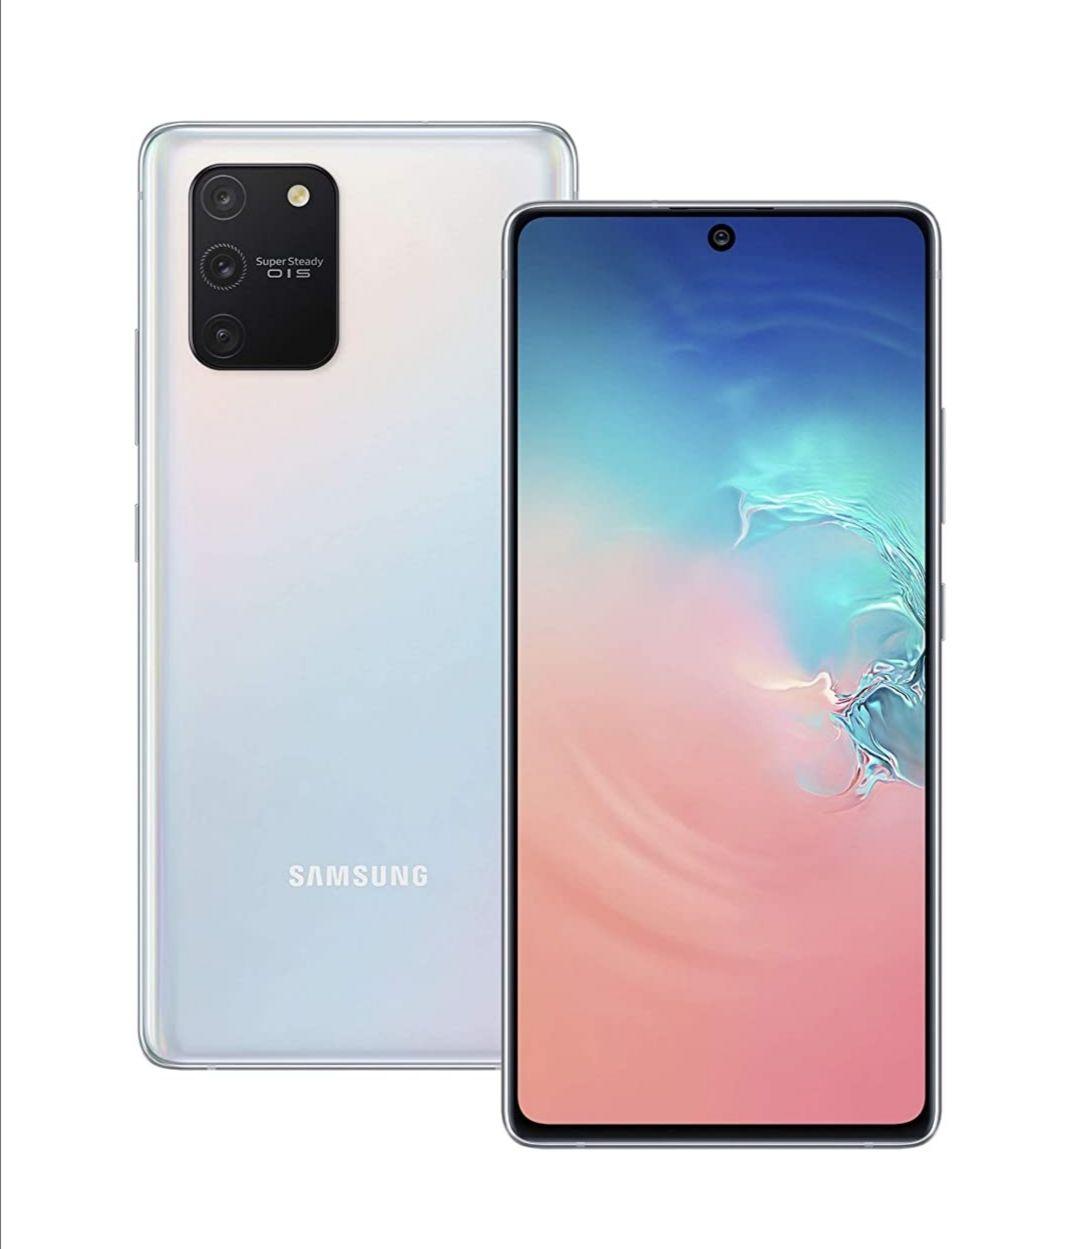 Samsung Galaxy S10 Lite 128GB 4500mAh Sim Free Smartphone - £399 @ Amazon (Prime Only)